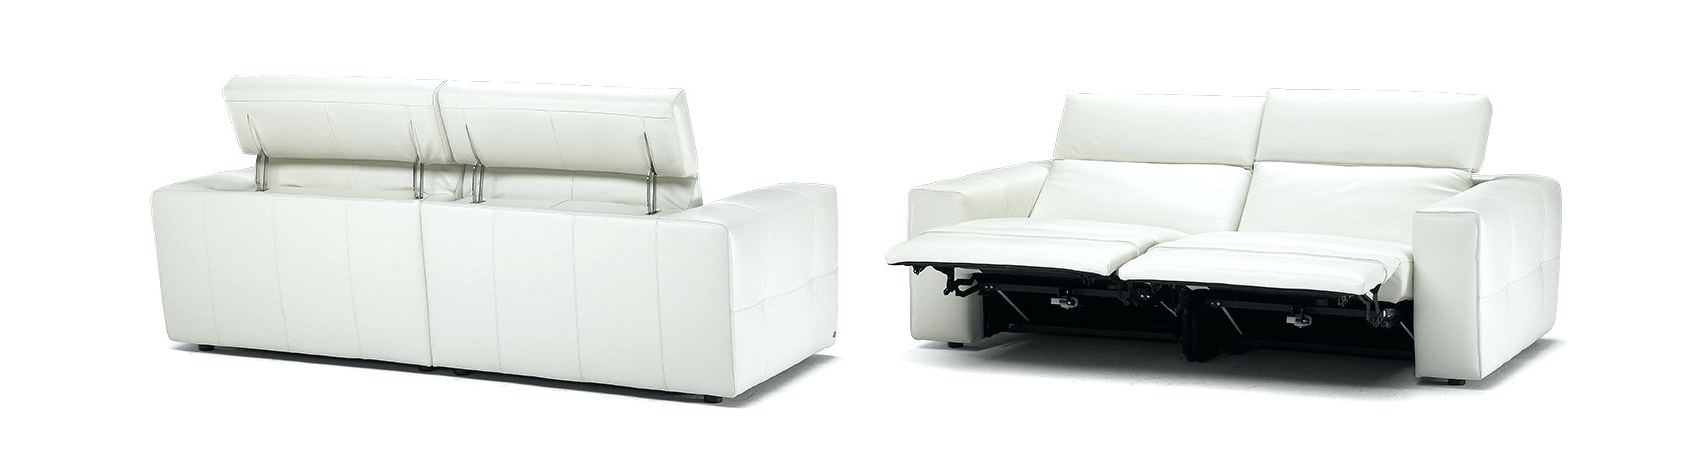 Natuzzi Zeta Chaise Lounge Chairs • Lounge Chairs Ideas With Regard To Fashionable Natuzzi Zeta Chaise Lounge Chairs (View 2 of 15)